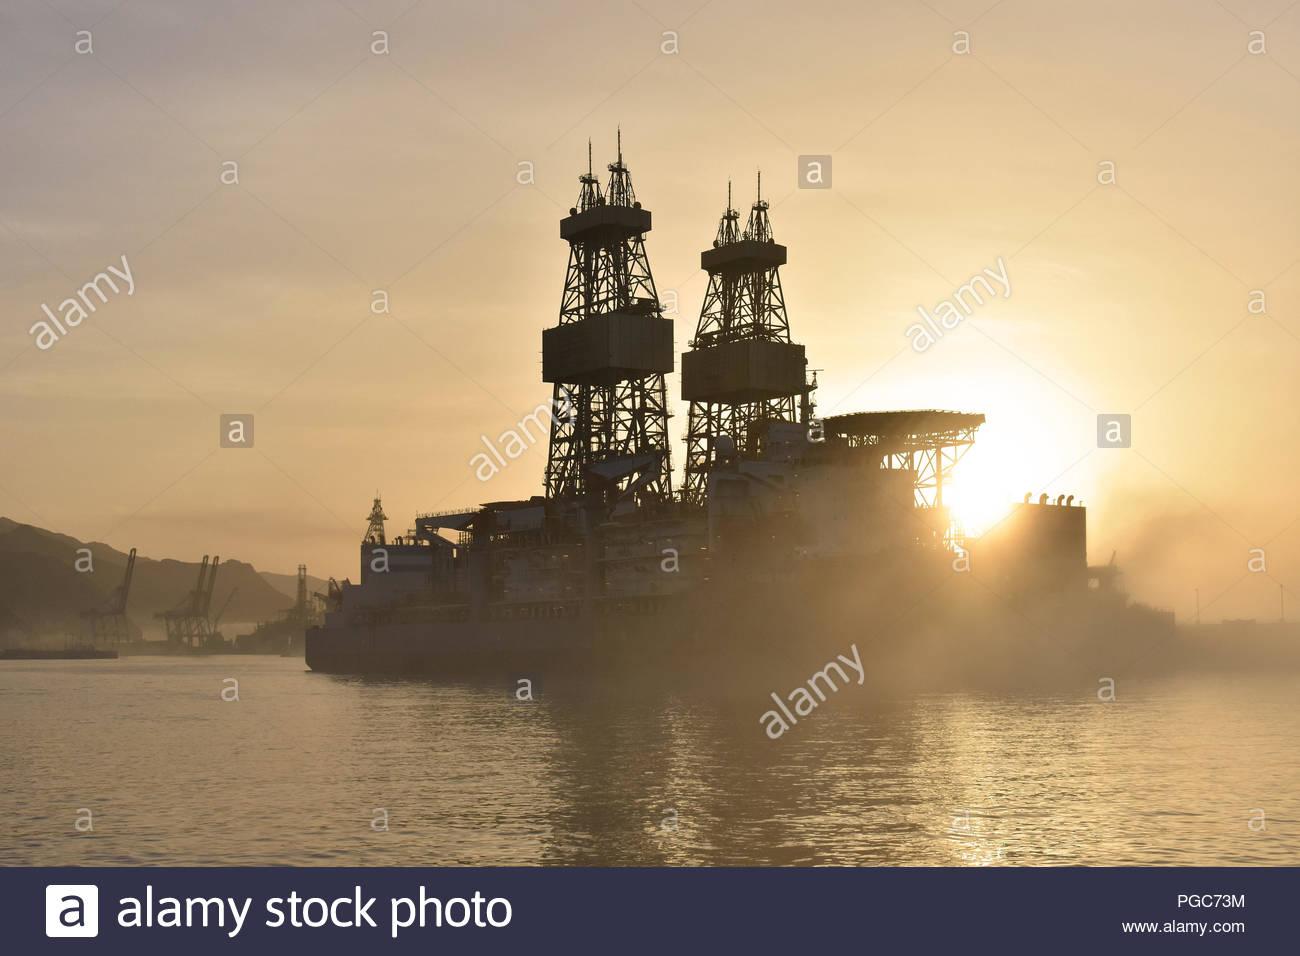 Drillship (oil rig platform) in morning fog. Santa Cruz de Tenerife harbor, Tenerife Canary Islands Spain. - Stock Image